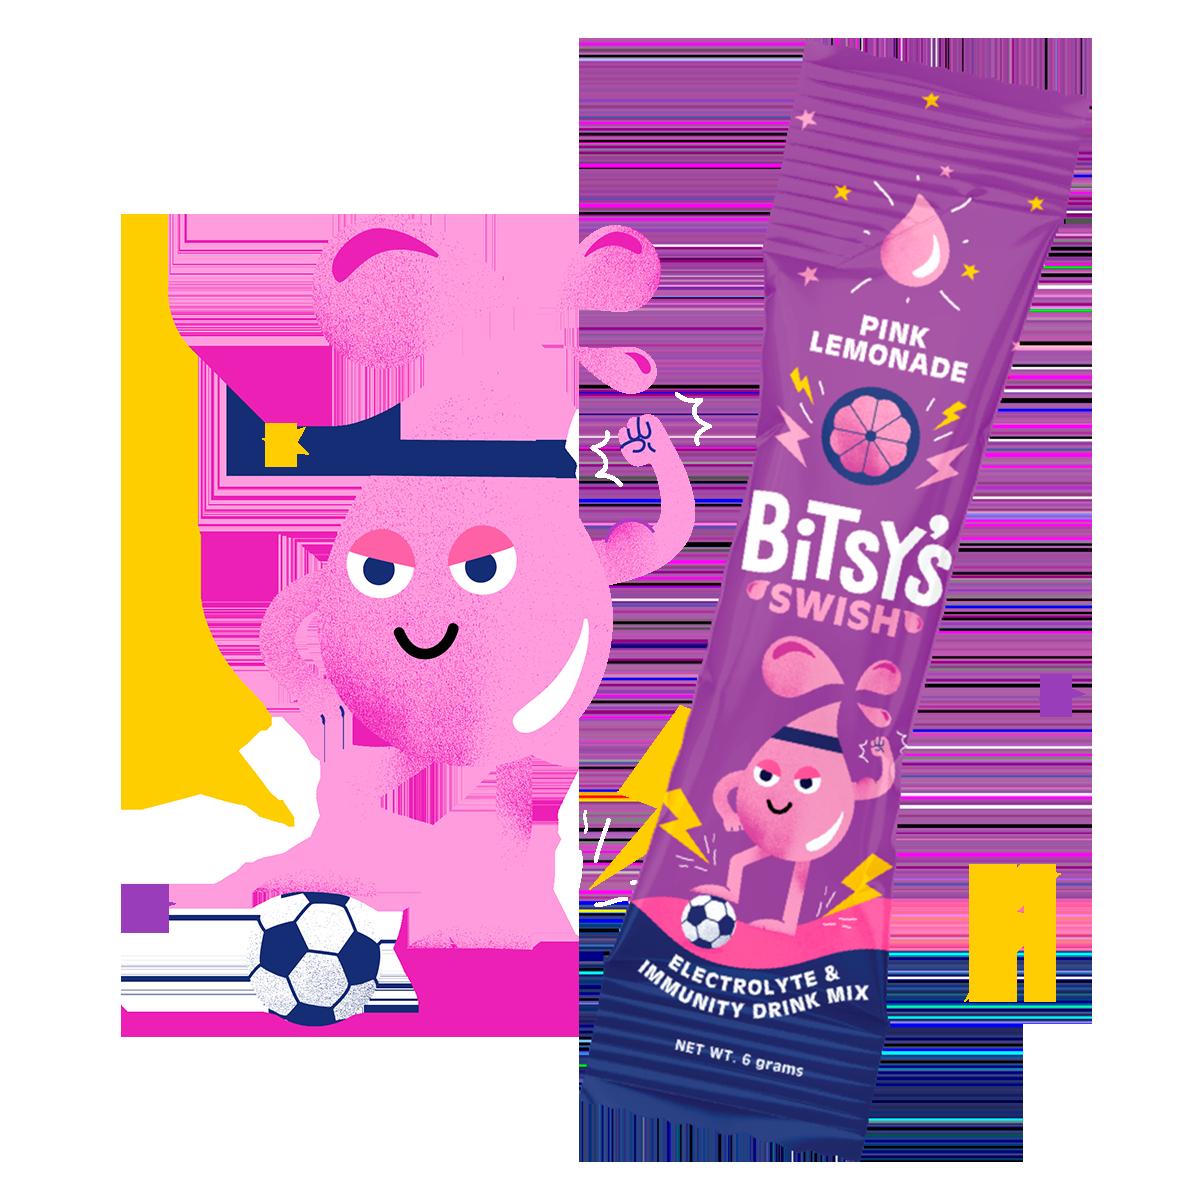 Bitsy's Pink Lemonade Swish character and packet